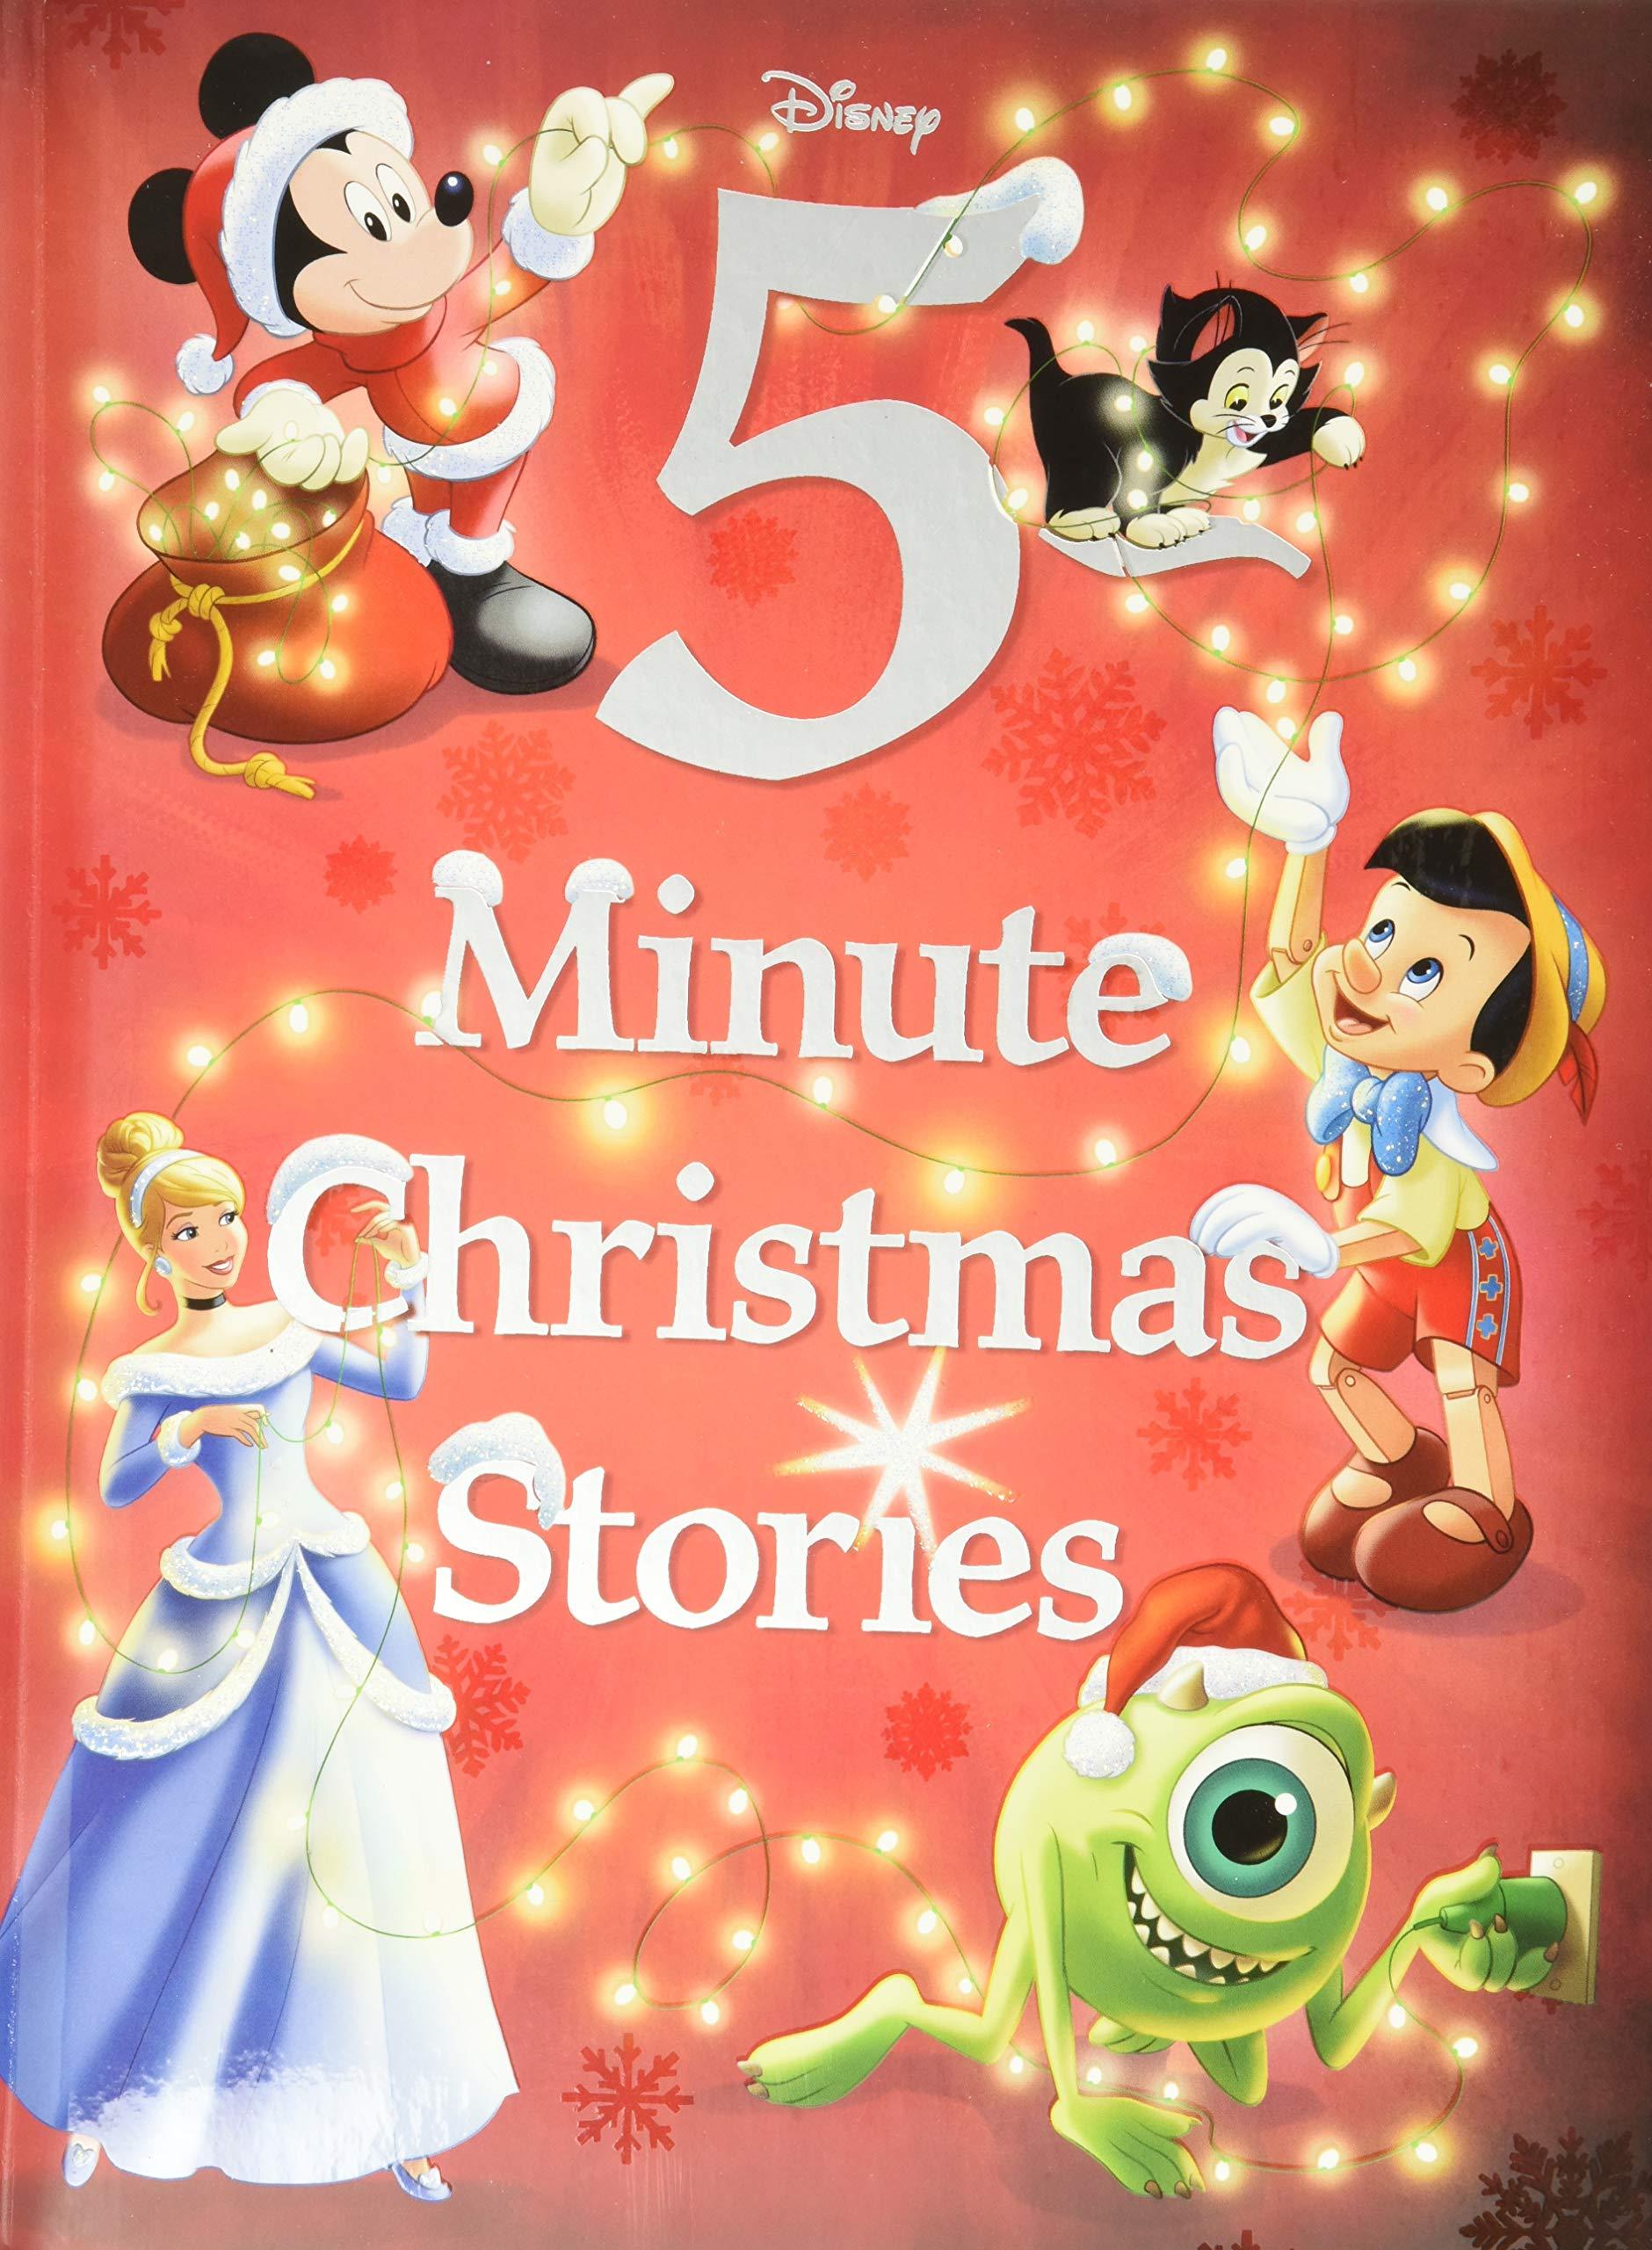 Disney 5 Minute Christmas Stories 5 Minute Stories Disney Books Disney Storybook Art Team 9781484727416 Books